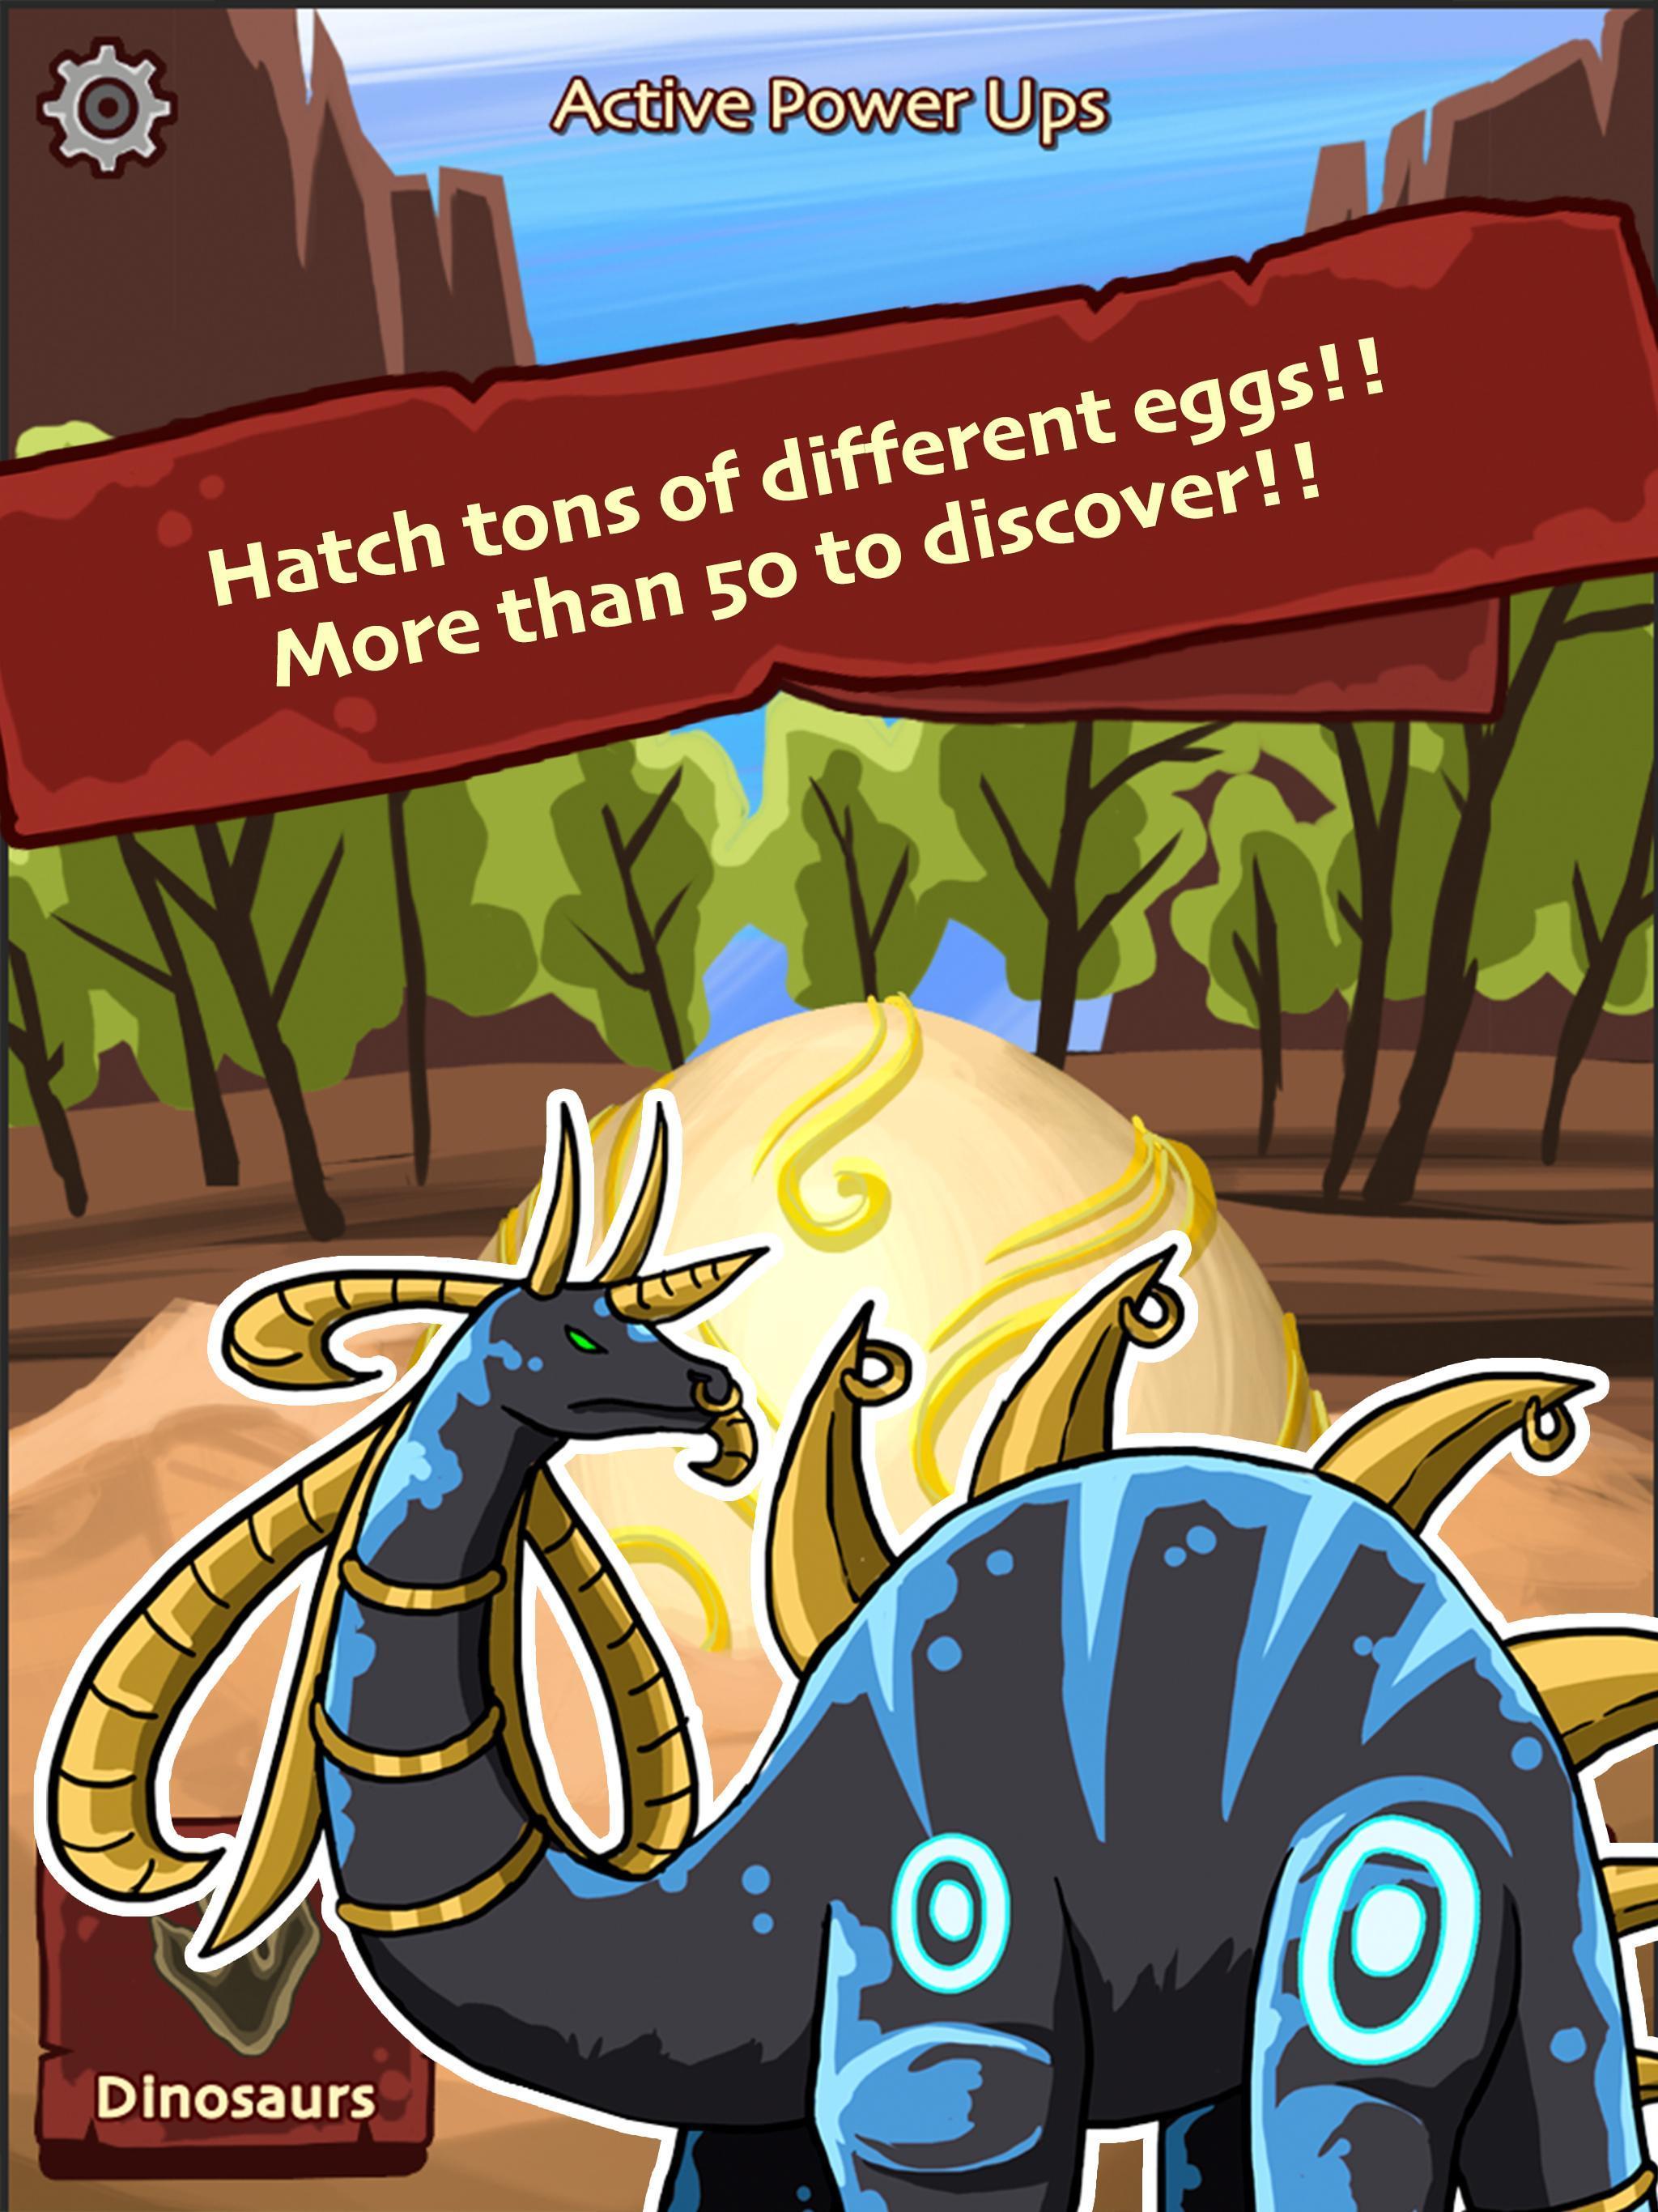 Hatch Dinosaur Eggs - Jurassic World Clicker Games 1.0.7 Screenshot 7